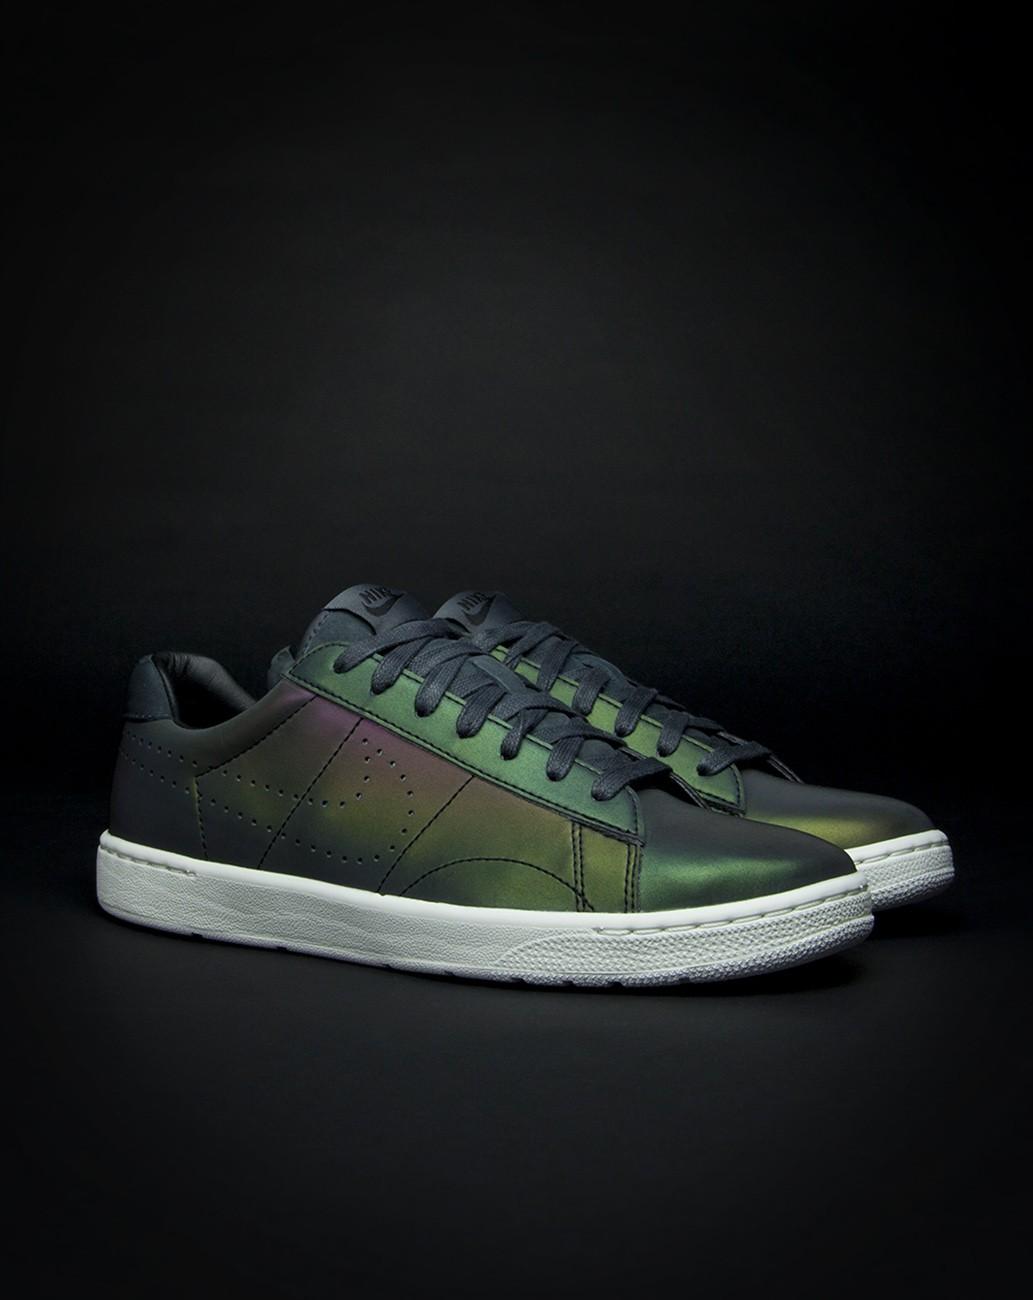 Nike new tennis classic QS